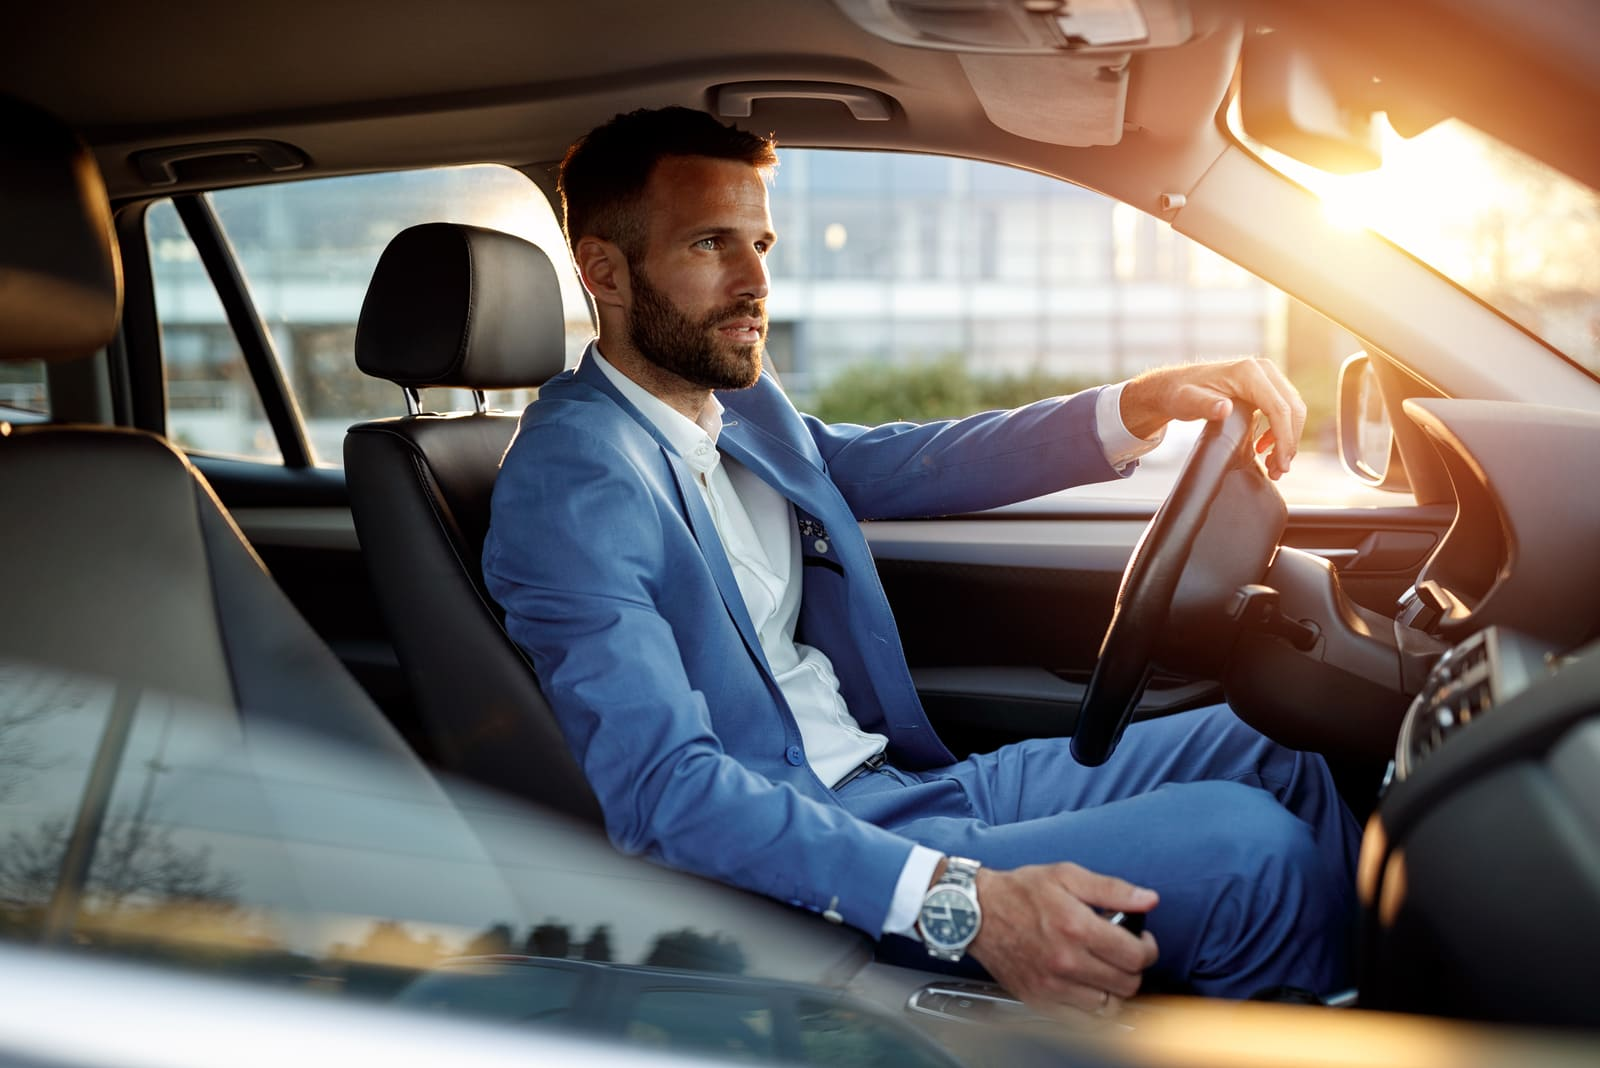 elegant man in business suit driving car